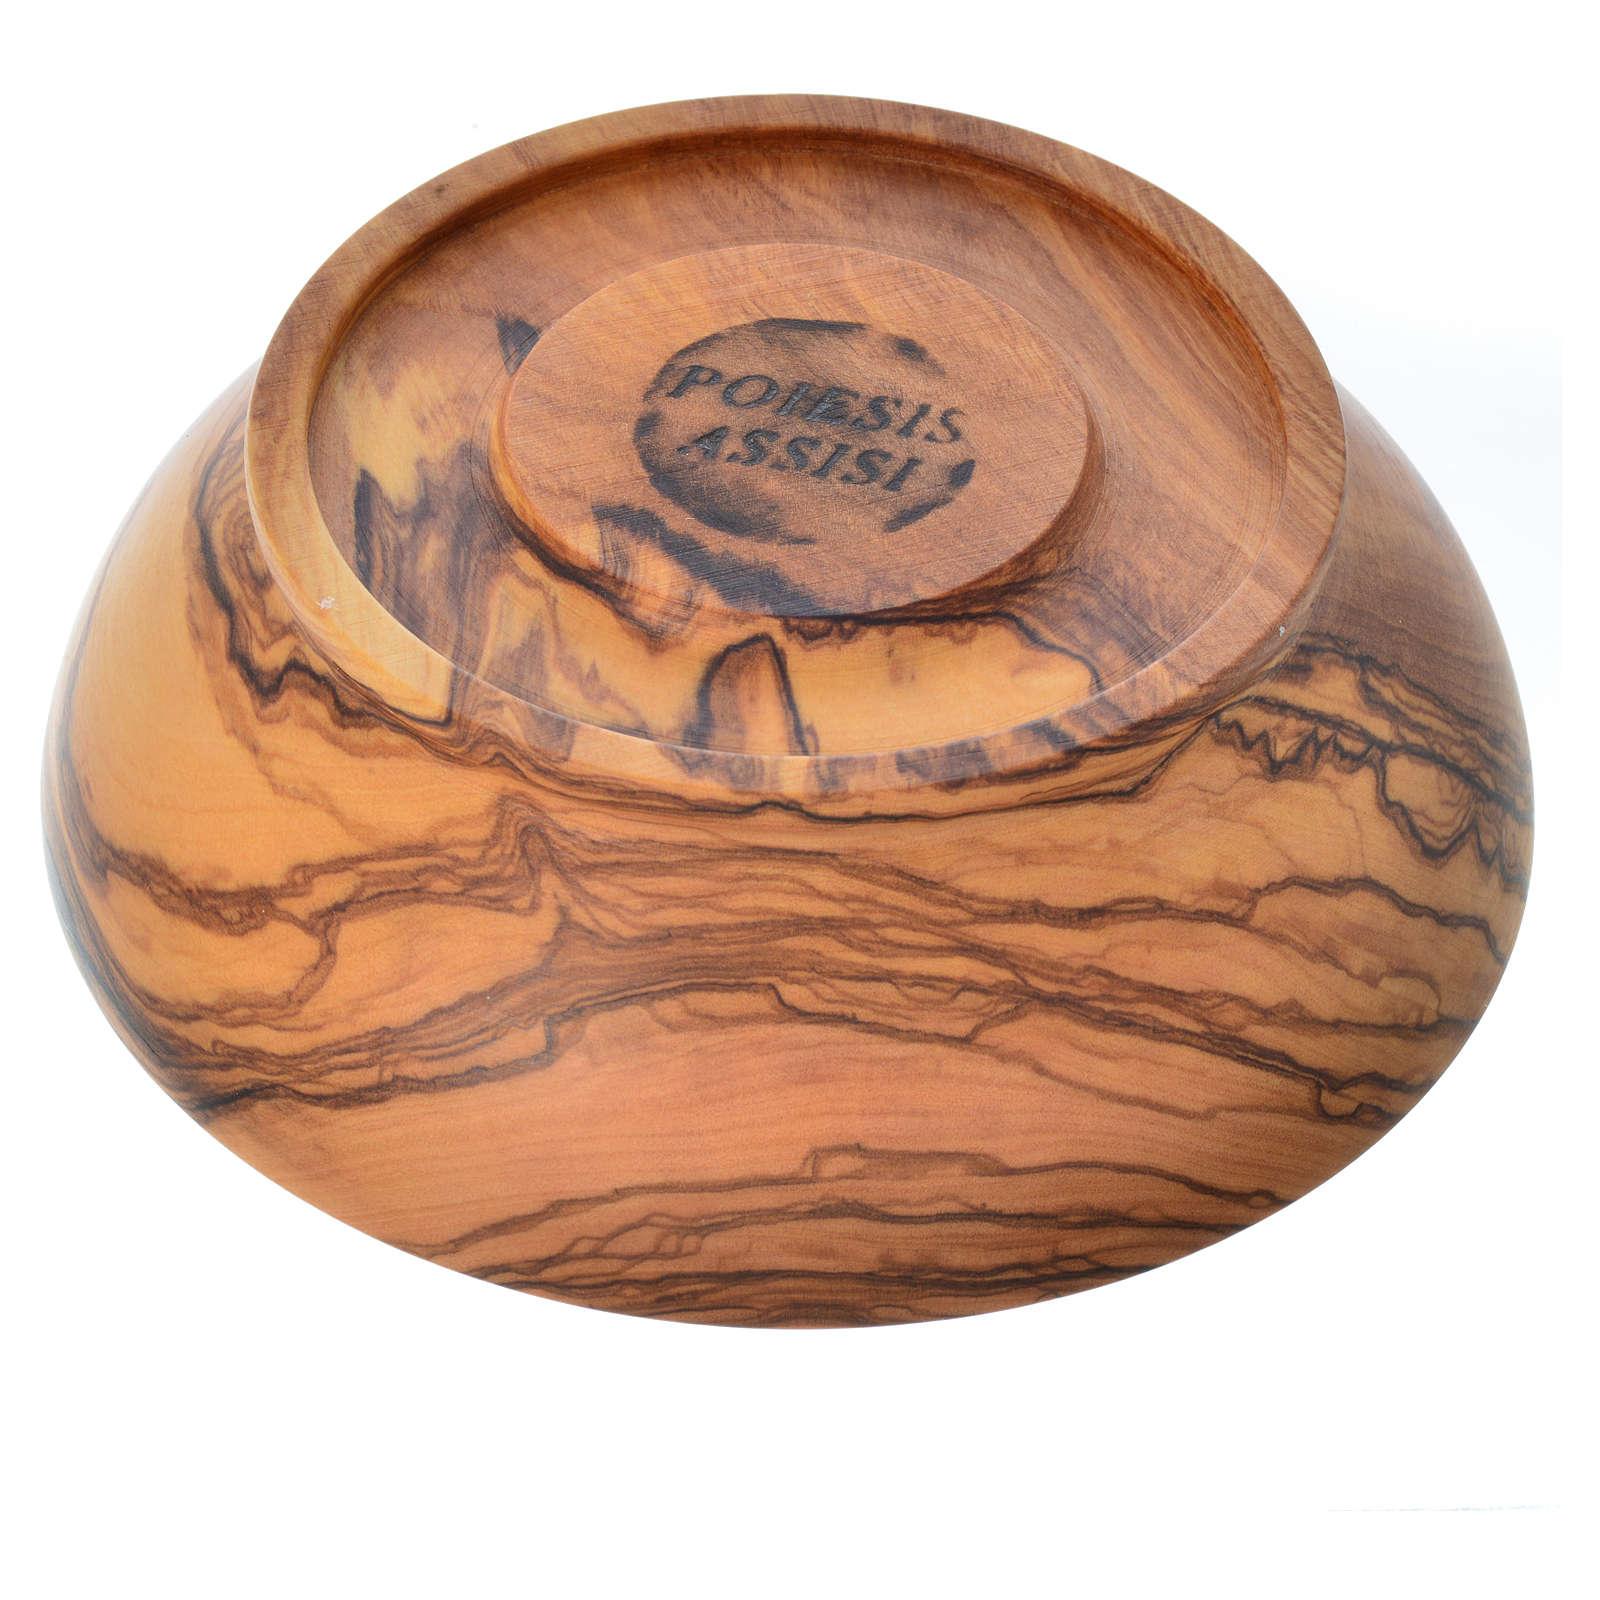 Patena de madera estacionada de olivo de Asís diámetro 13.5cm 4